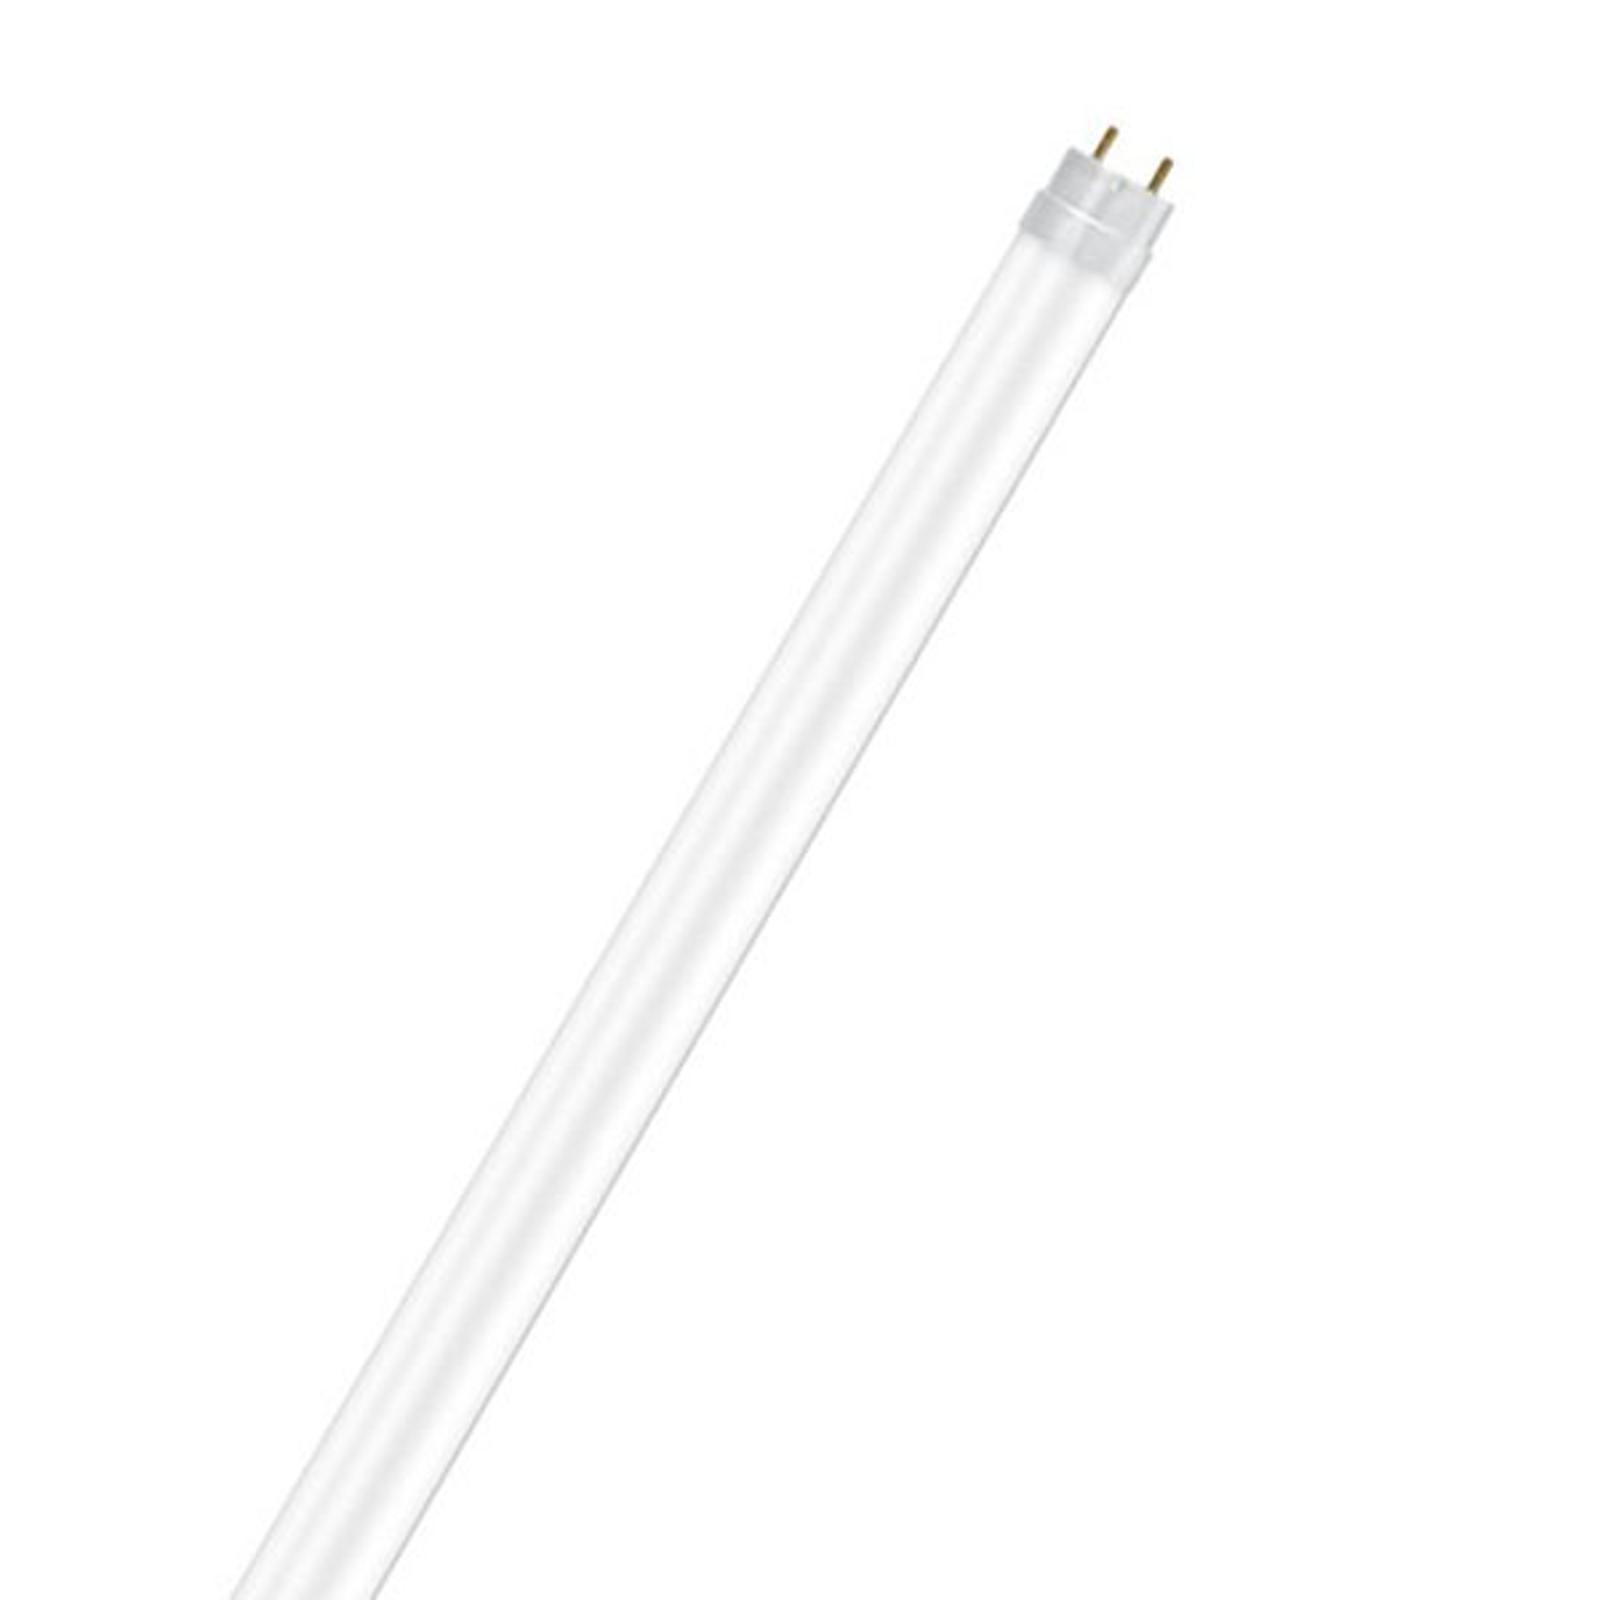 OSRAM-LED-putki G13 T8 60cm SubstiTUBE 7,3W 6 500K